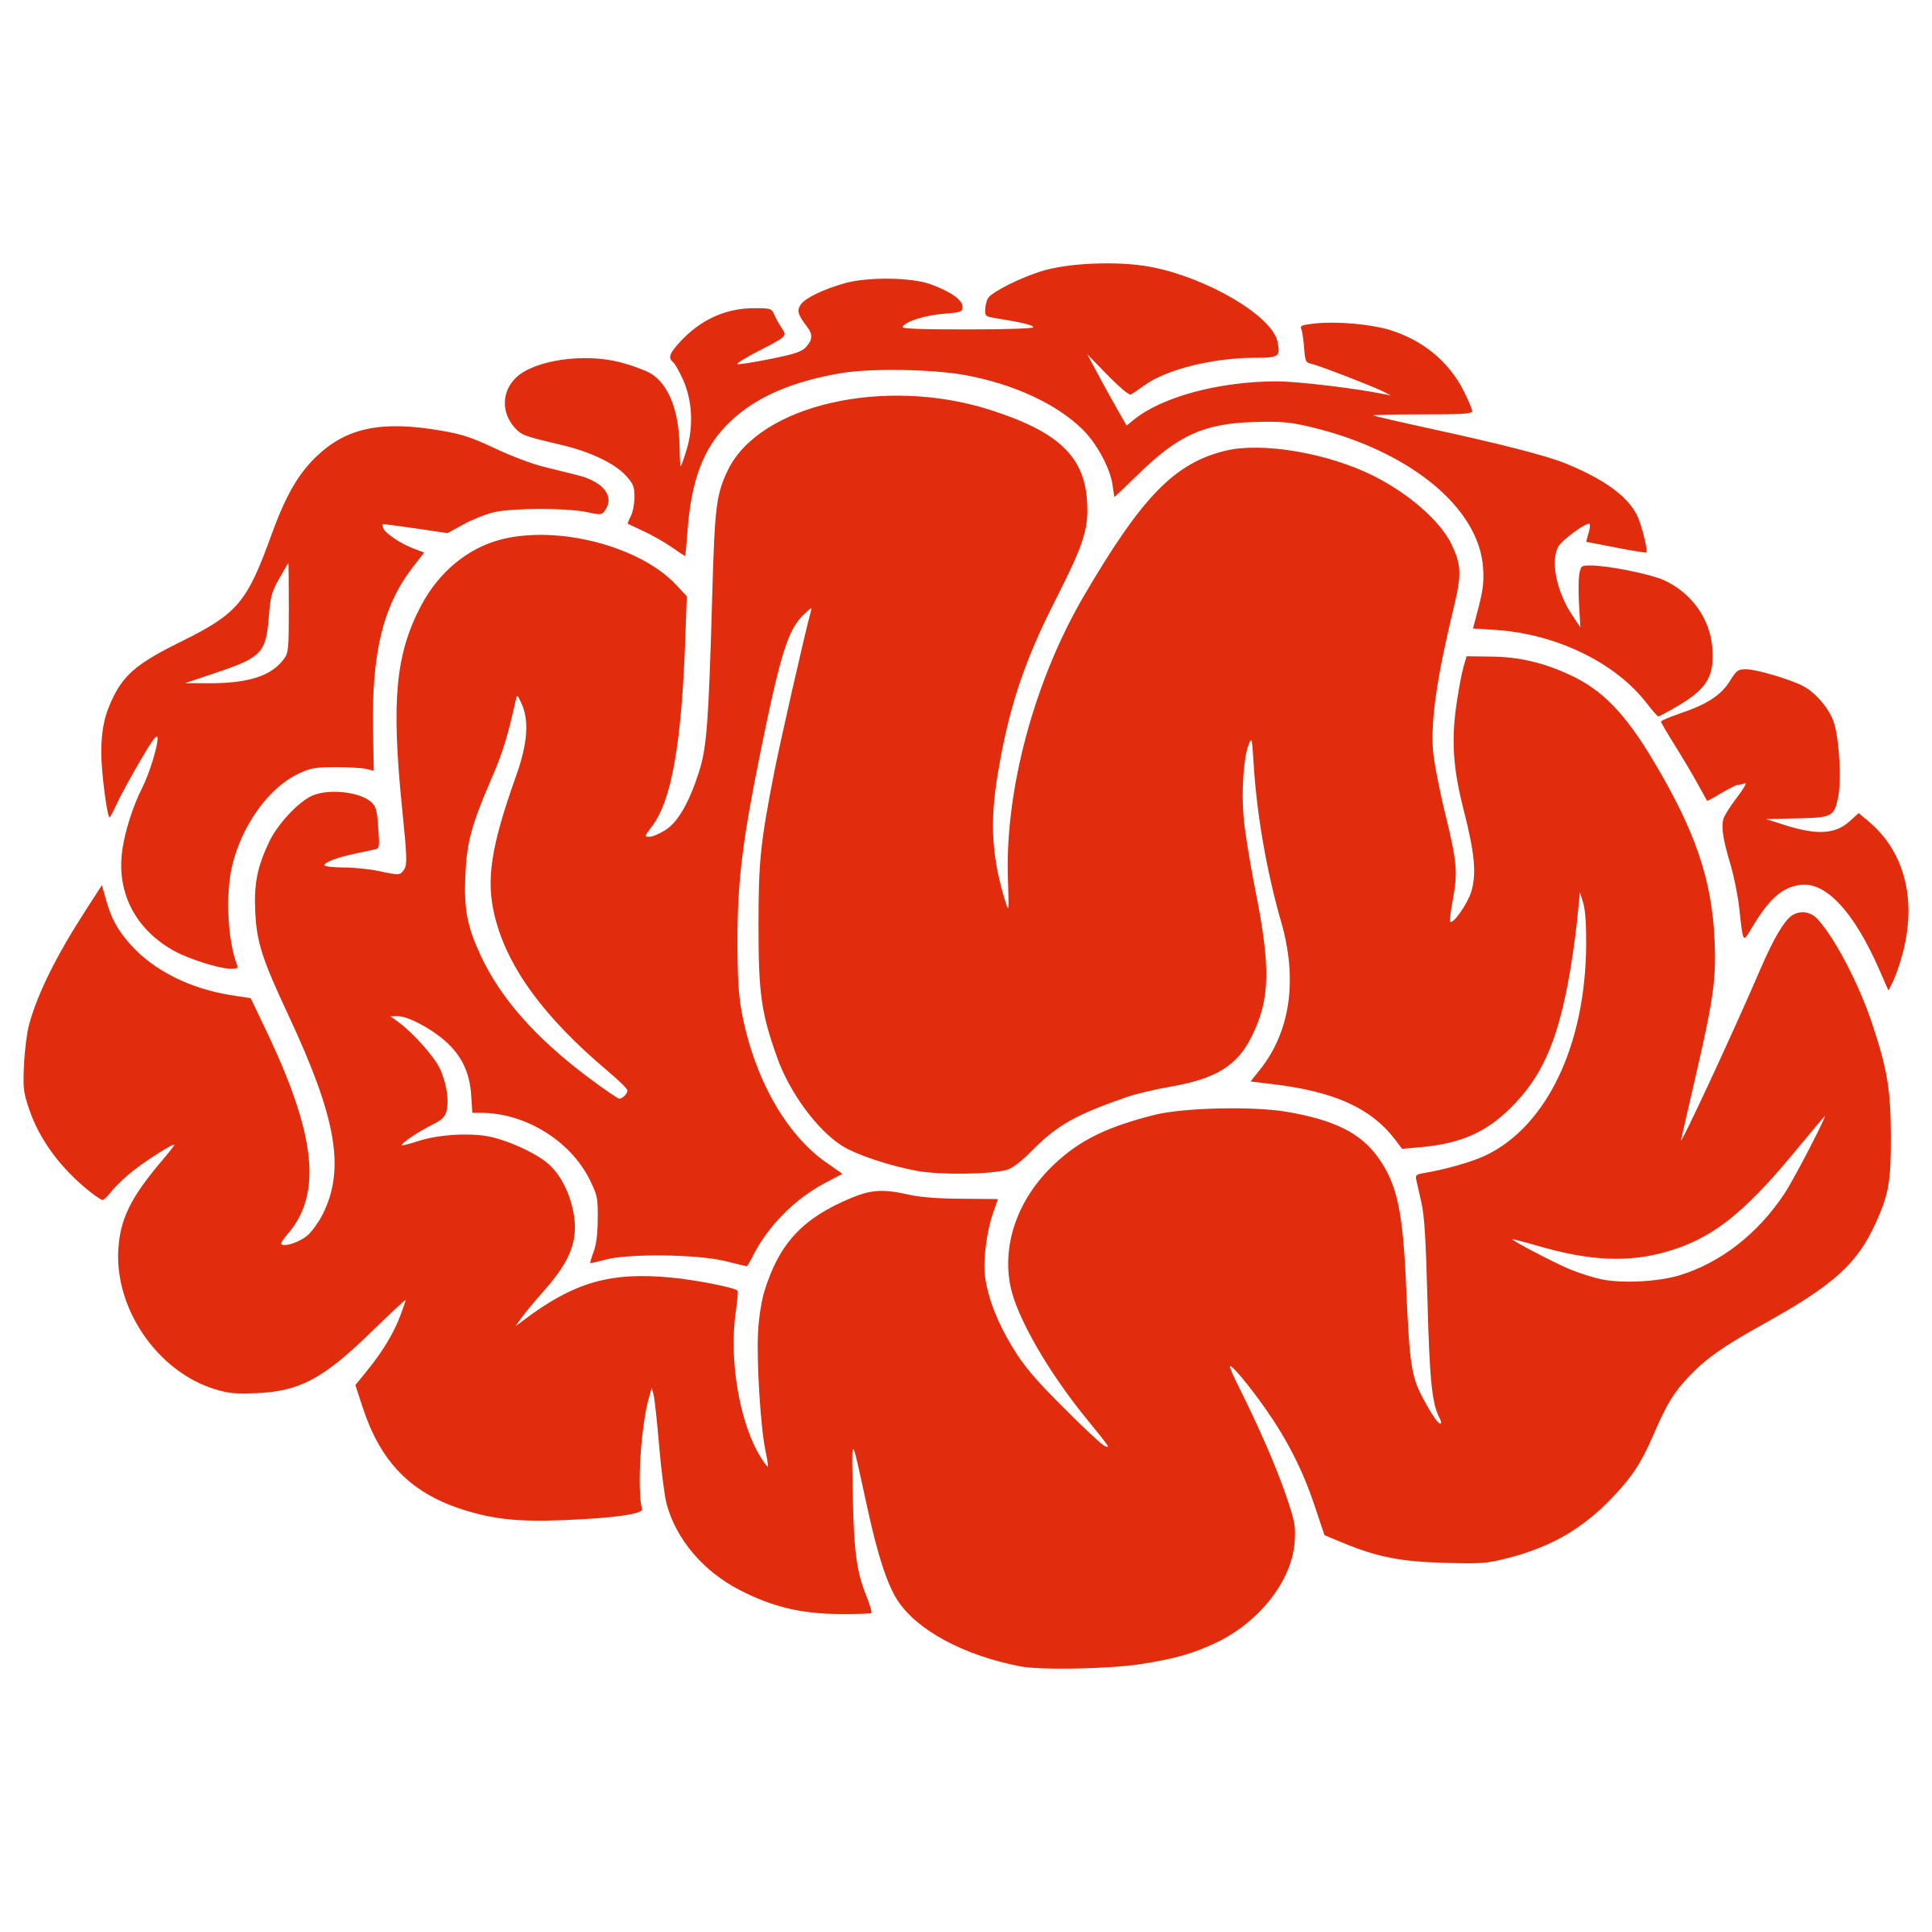 Brain clipart Images Brain Brain clipartcow free